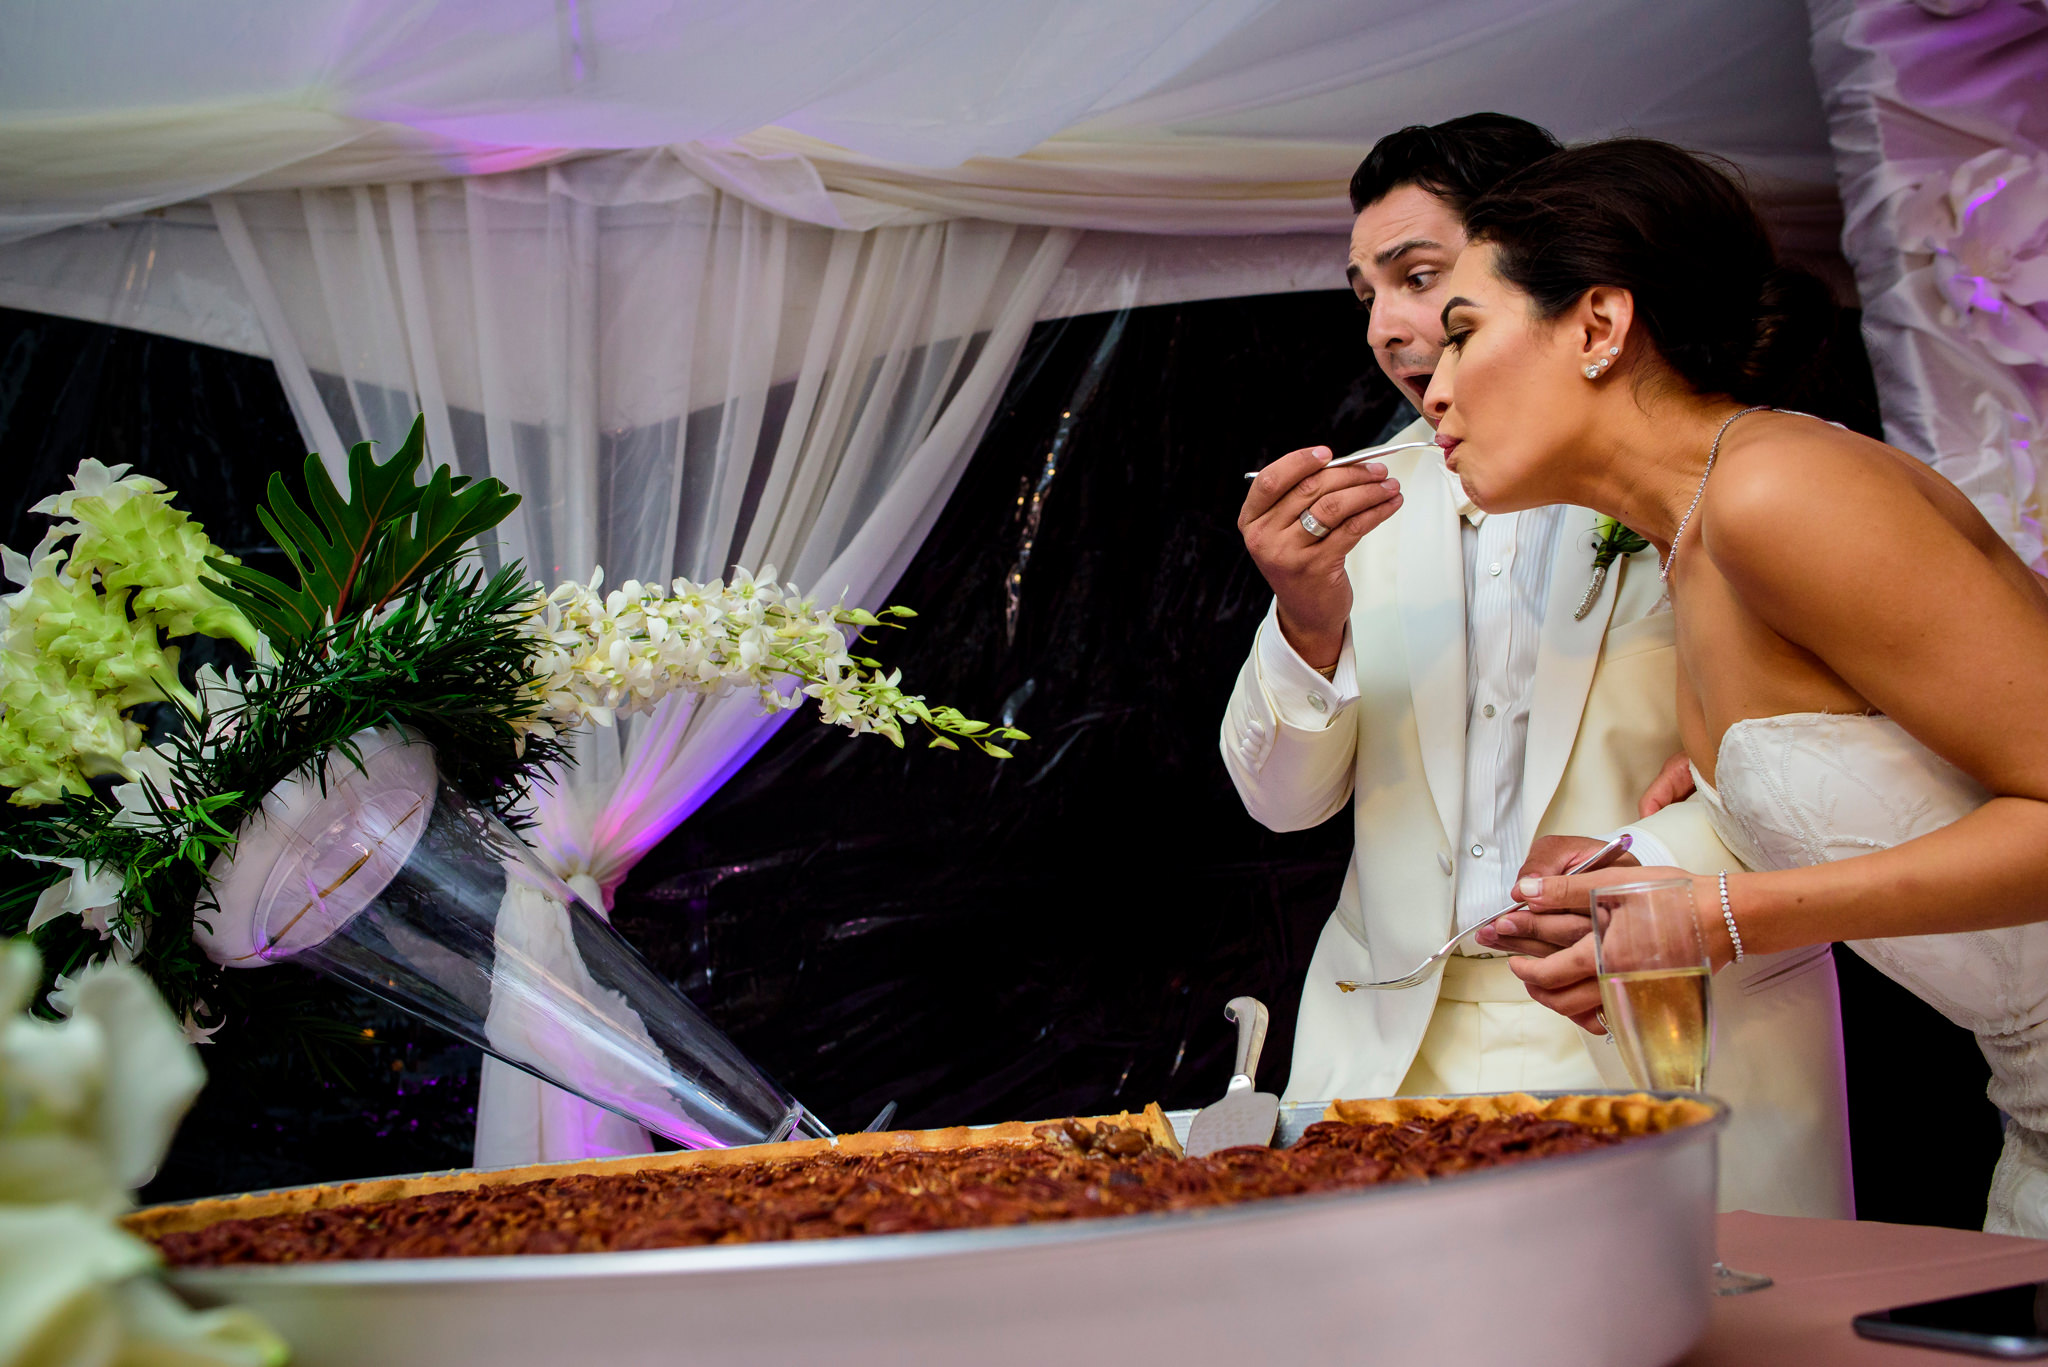 32-ashley-conner-four-seasons-resort-hualalai-wedding